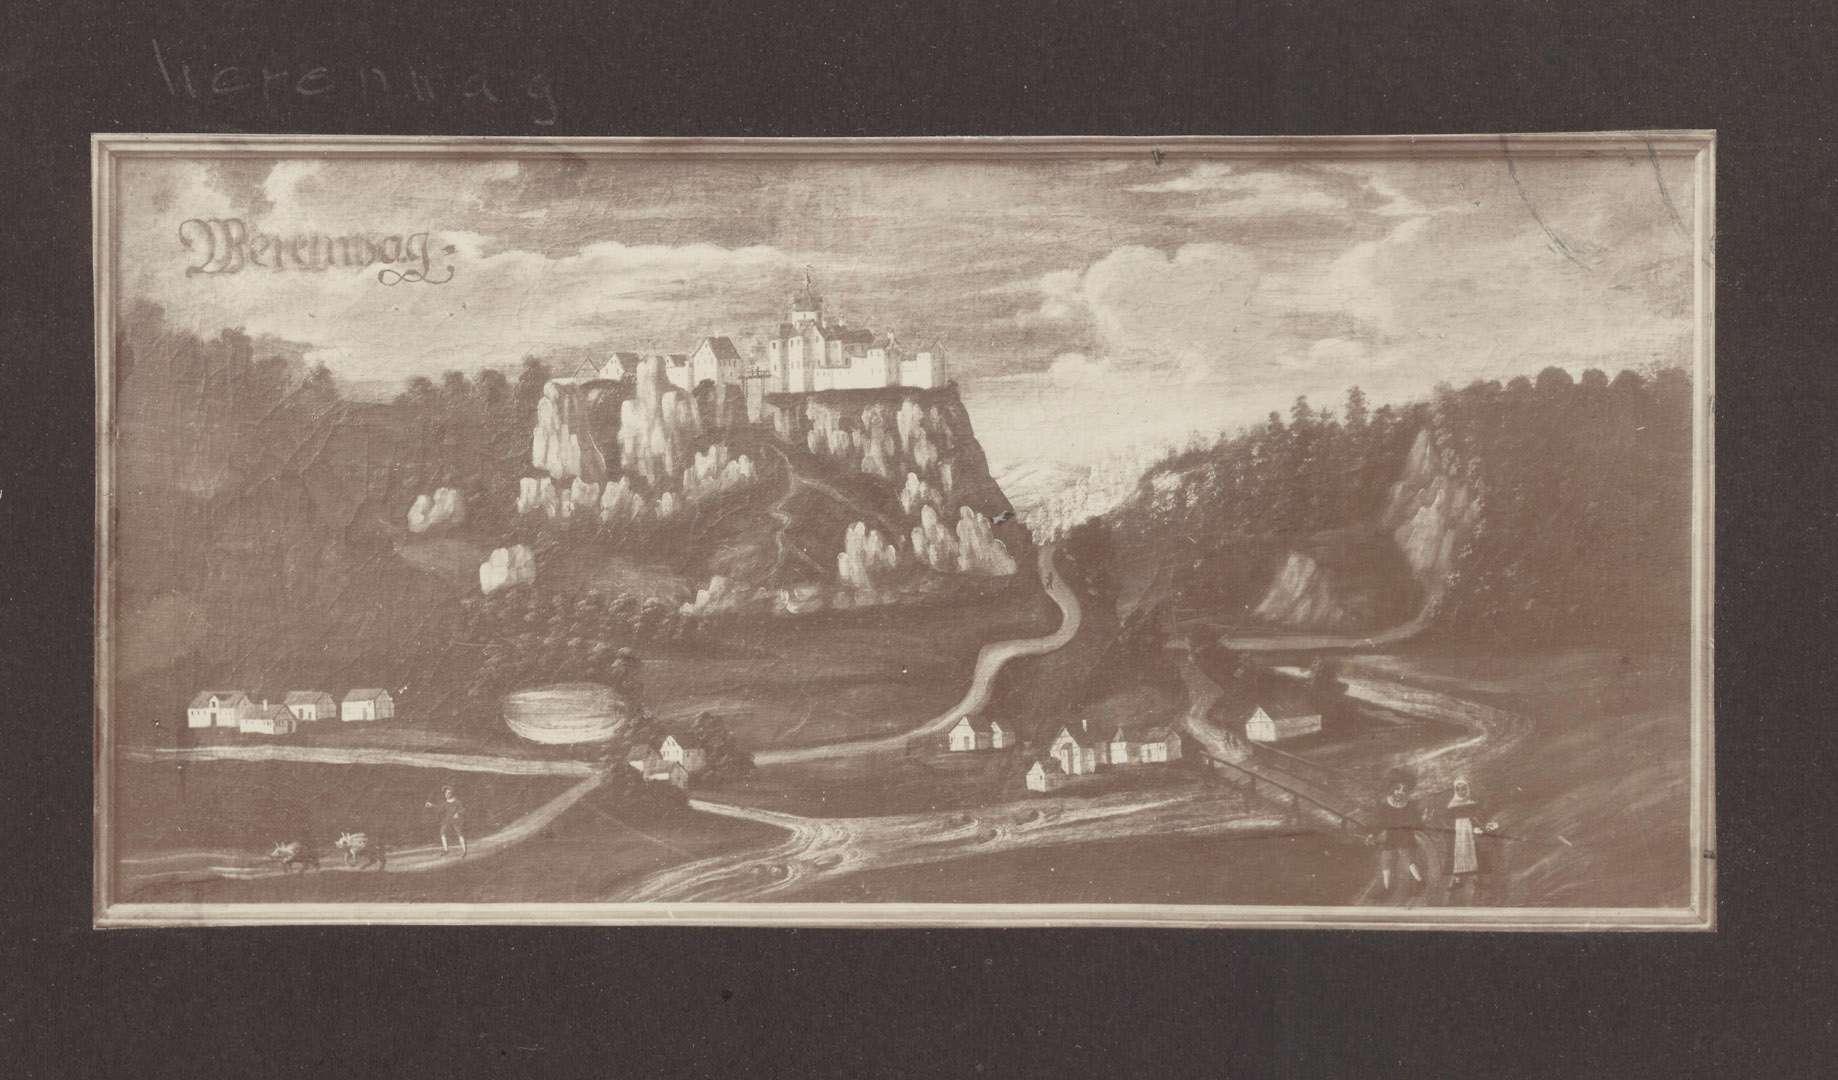 Werenwaag [Schloss Werenwag], Bild 1